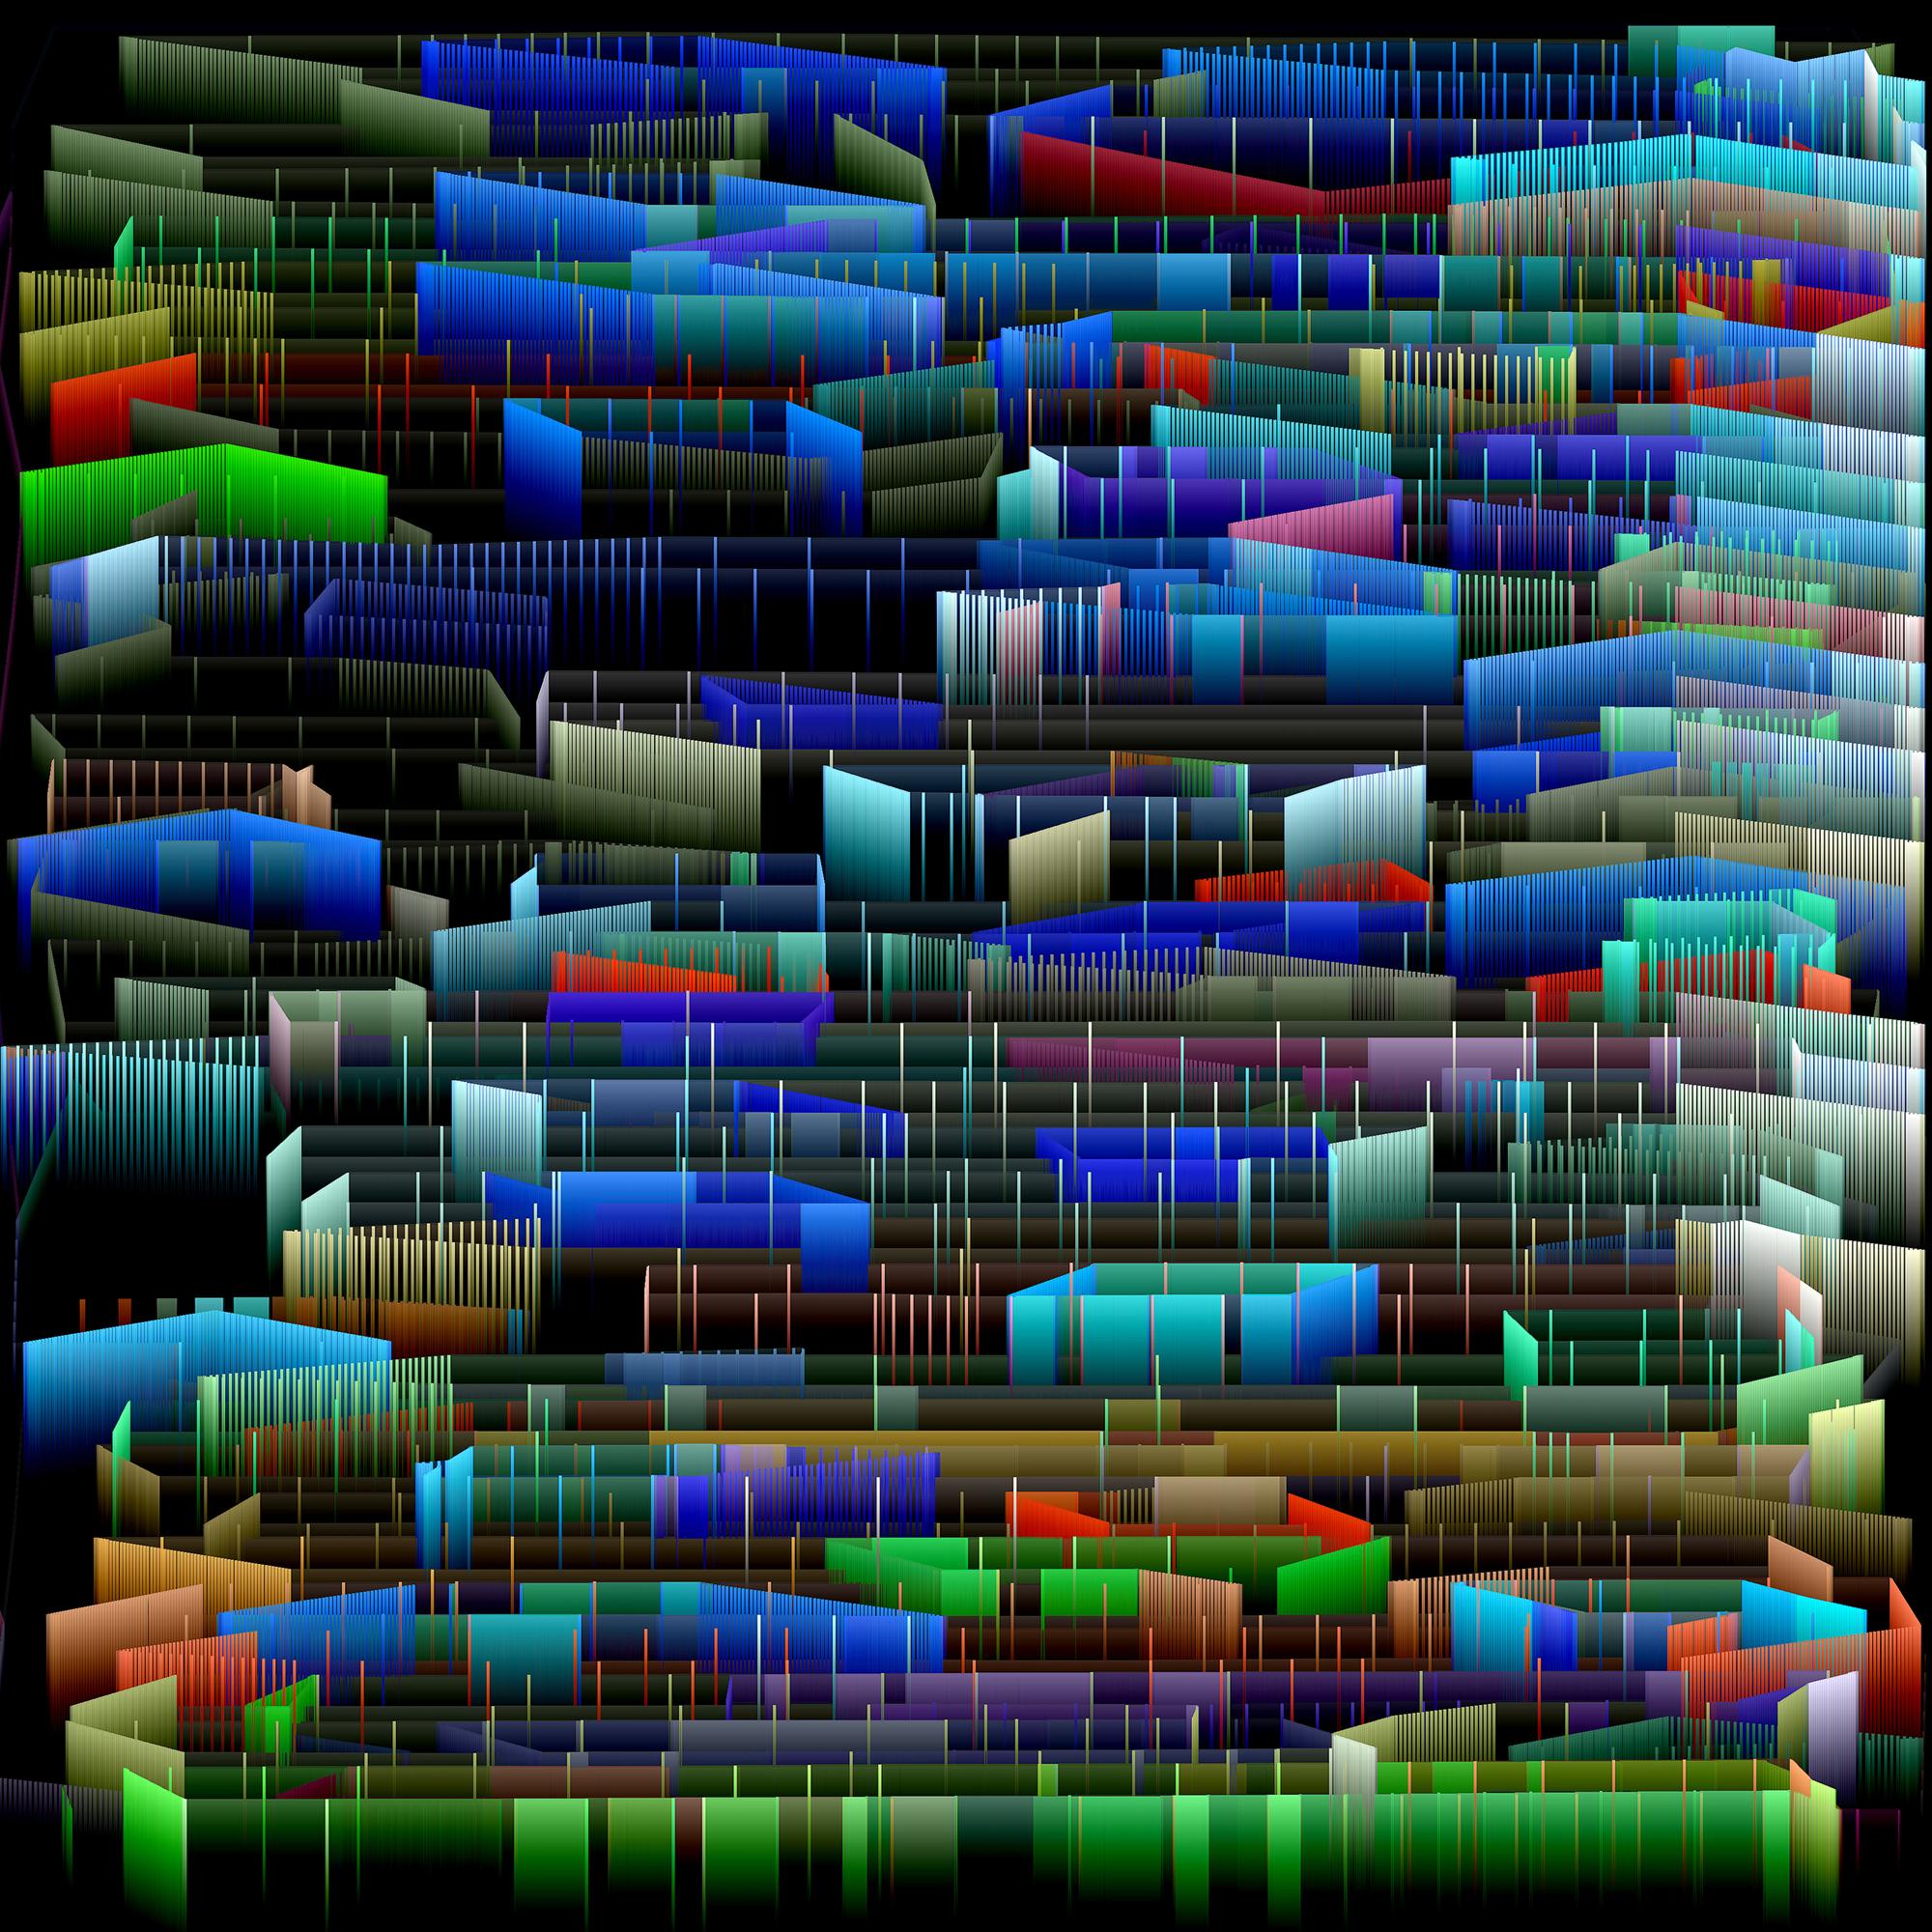 Ligtrooms color rooms